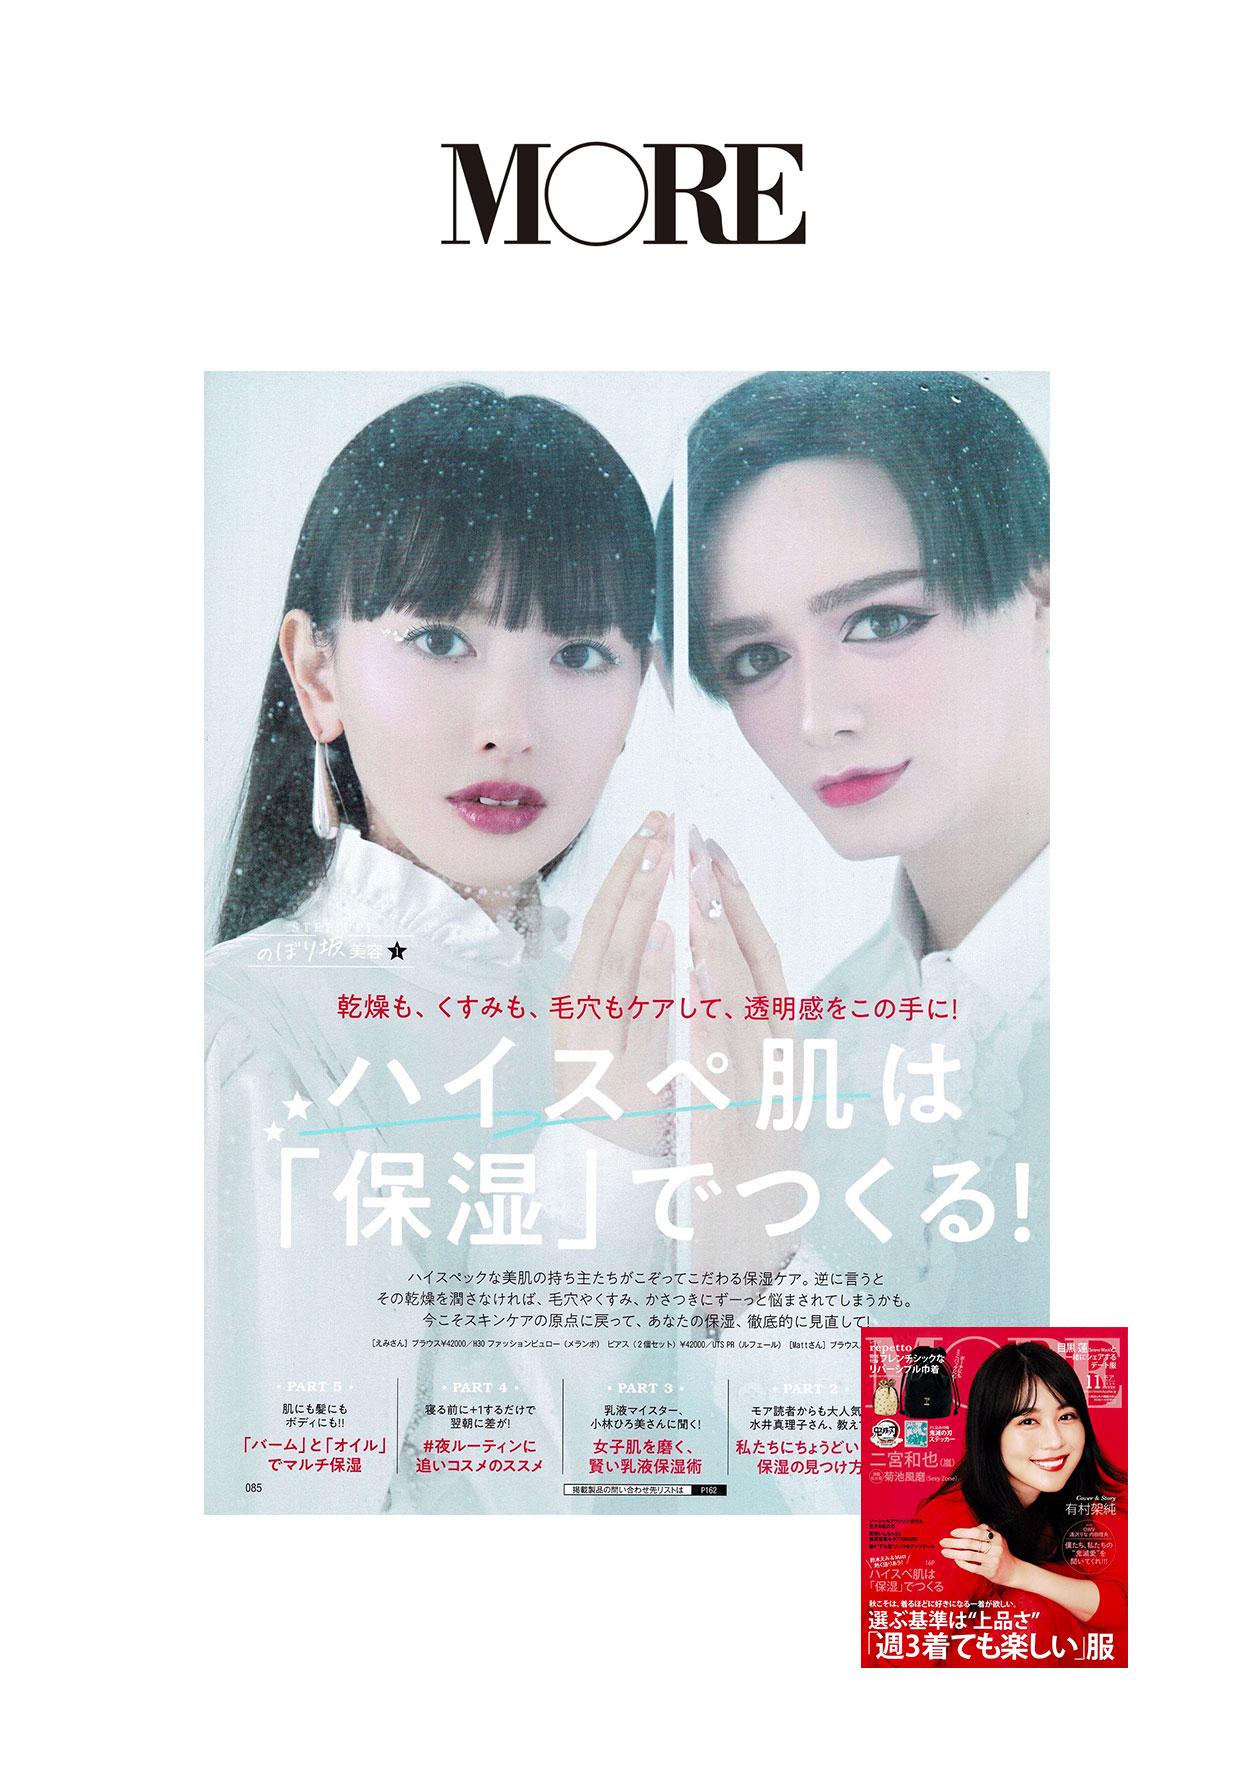 melampo-press-more-magazine